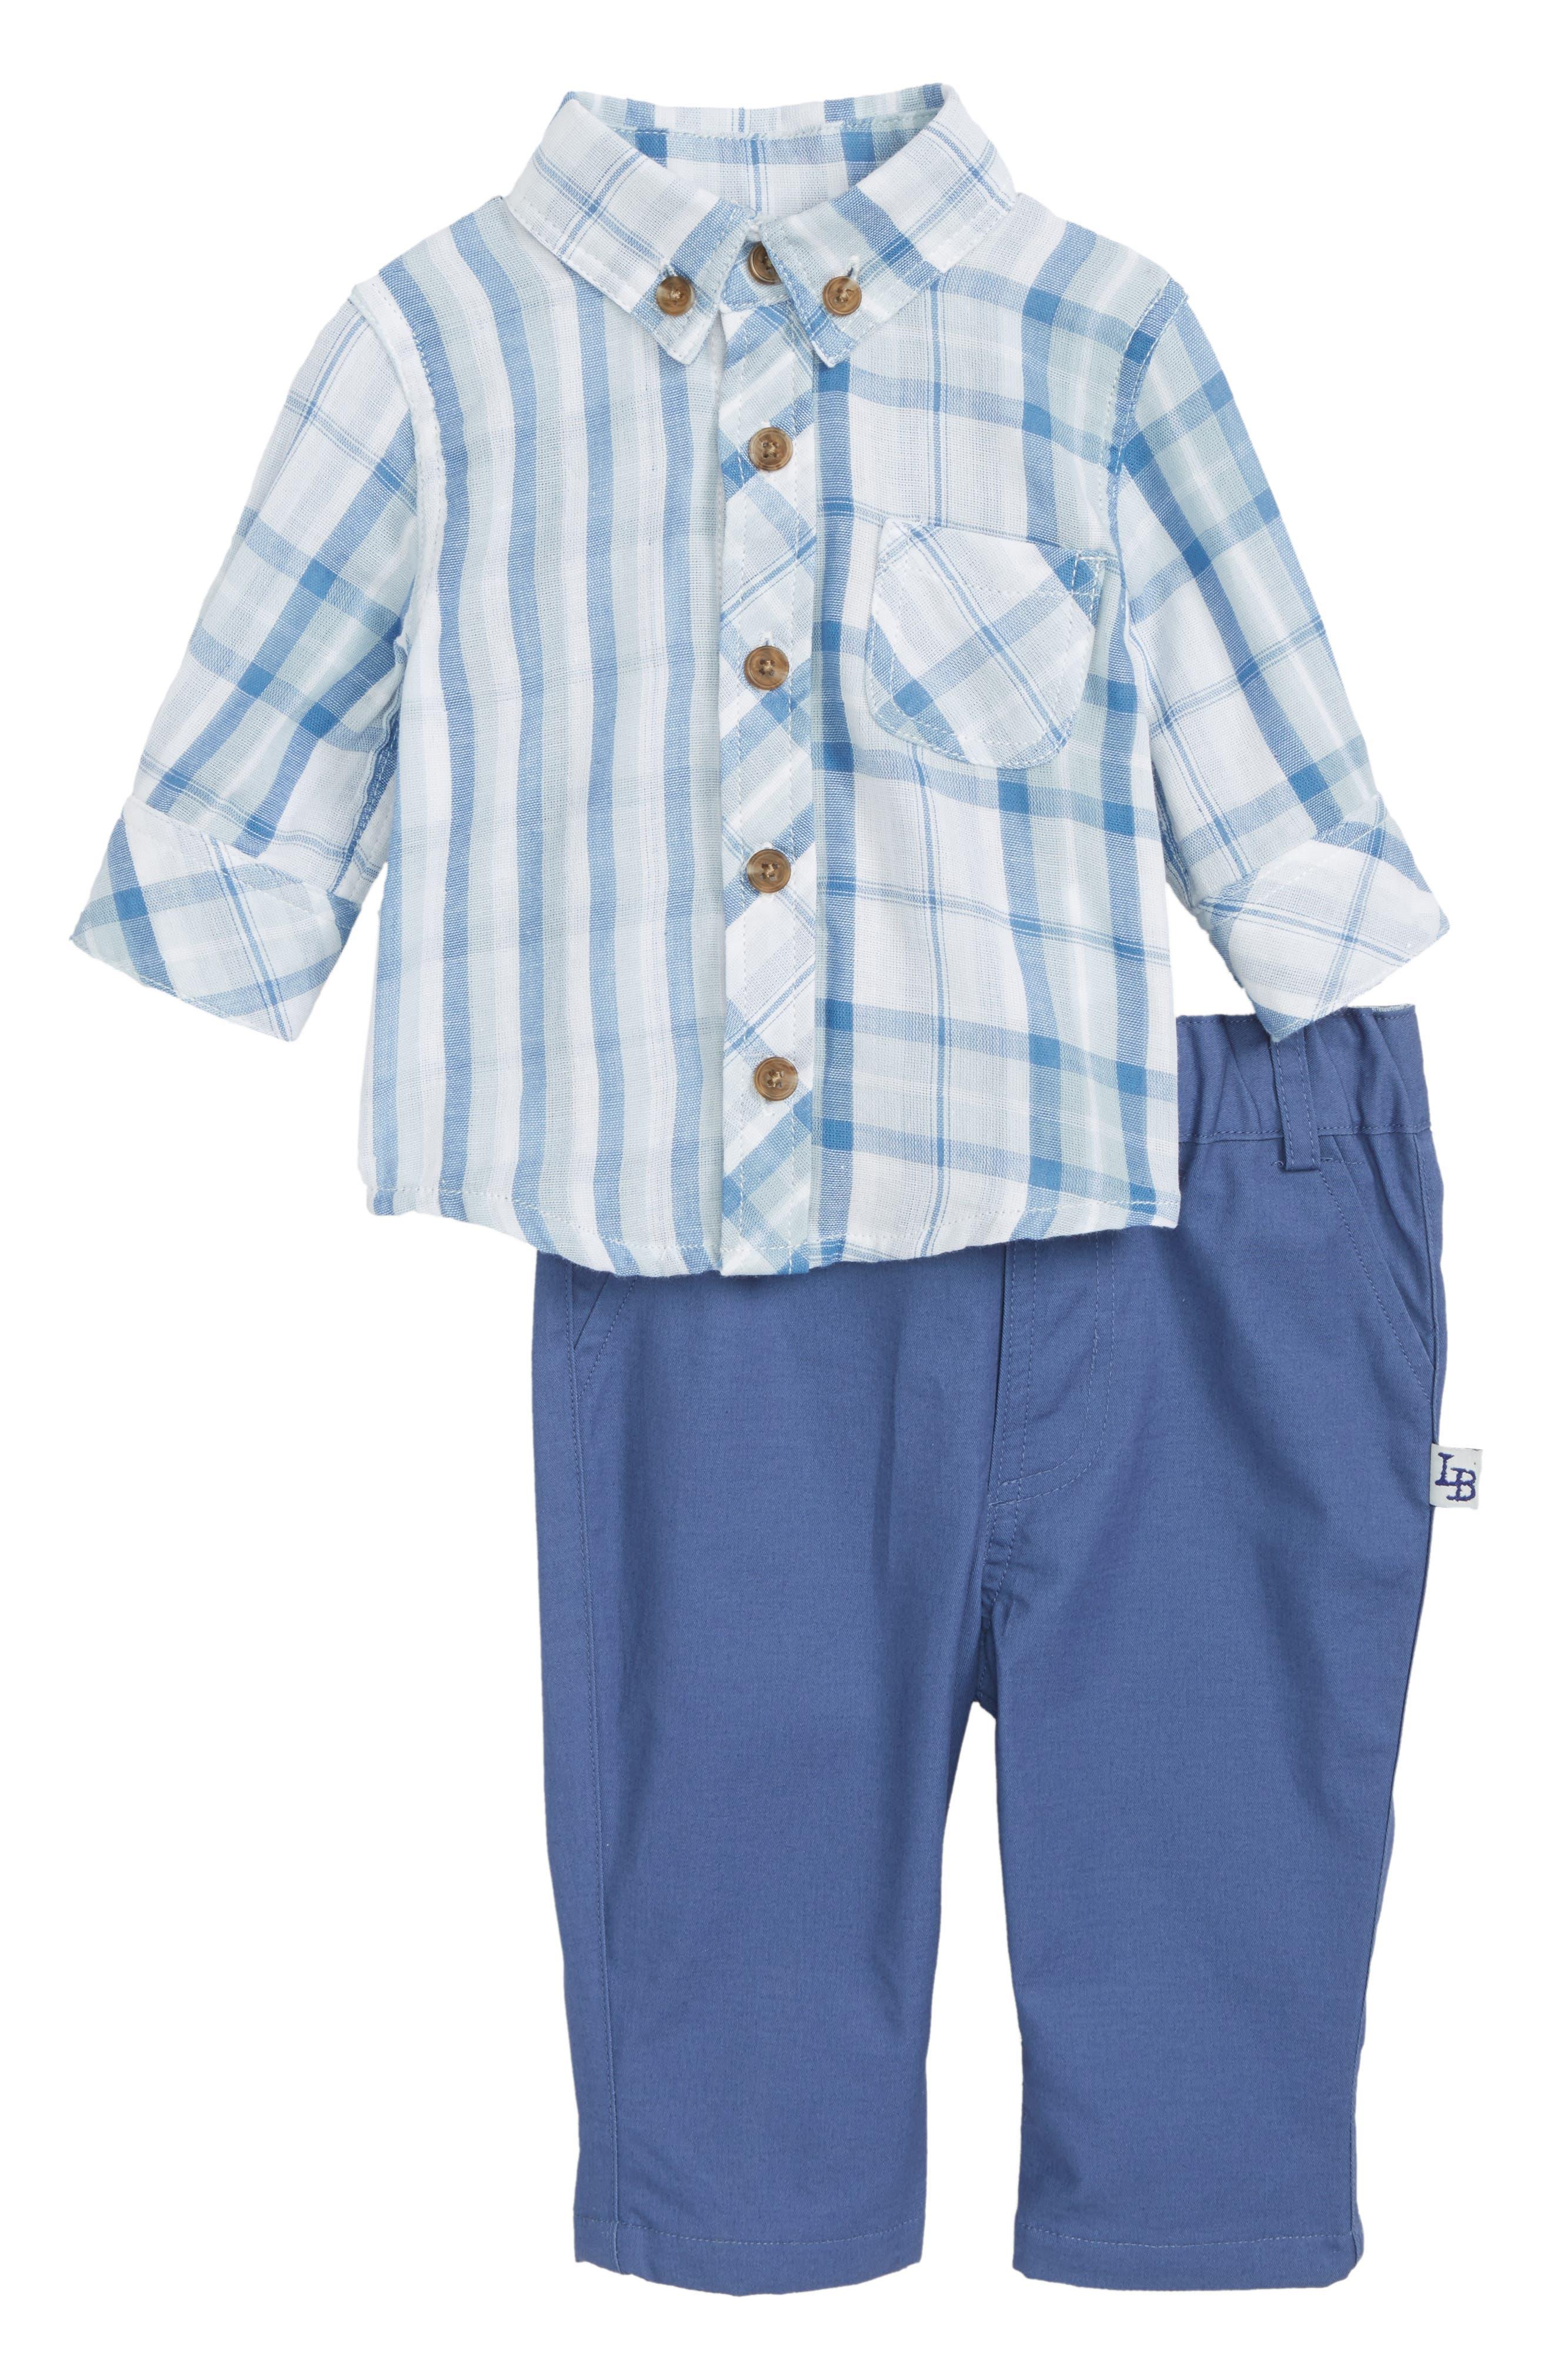 Mixed Plaid Top & Pants Set,                         Main,                         color, Blue